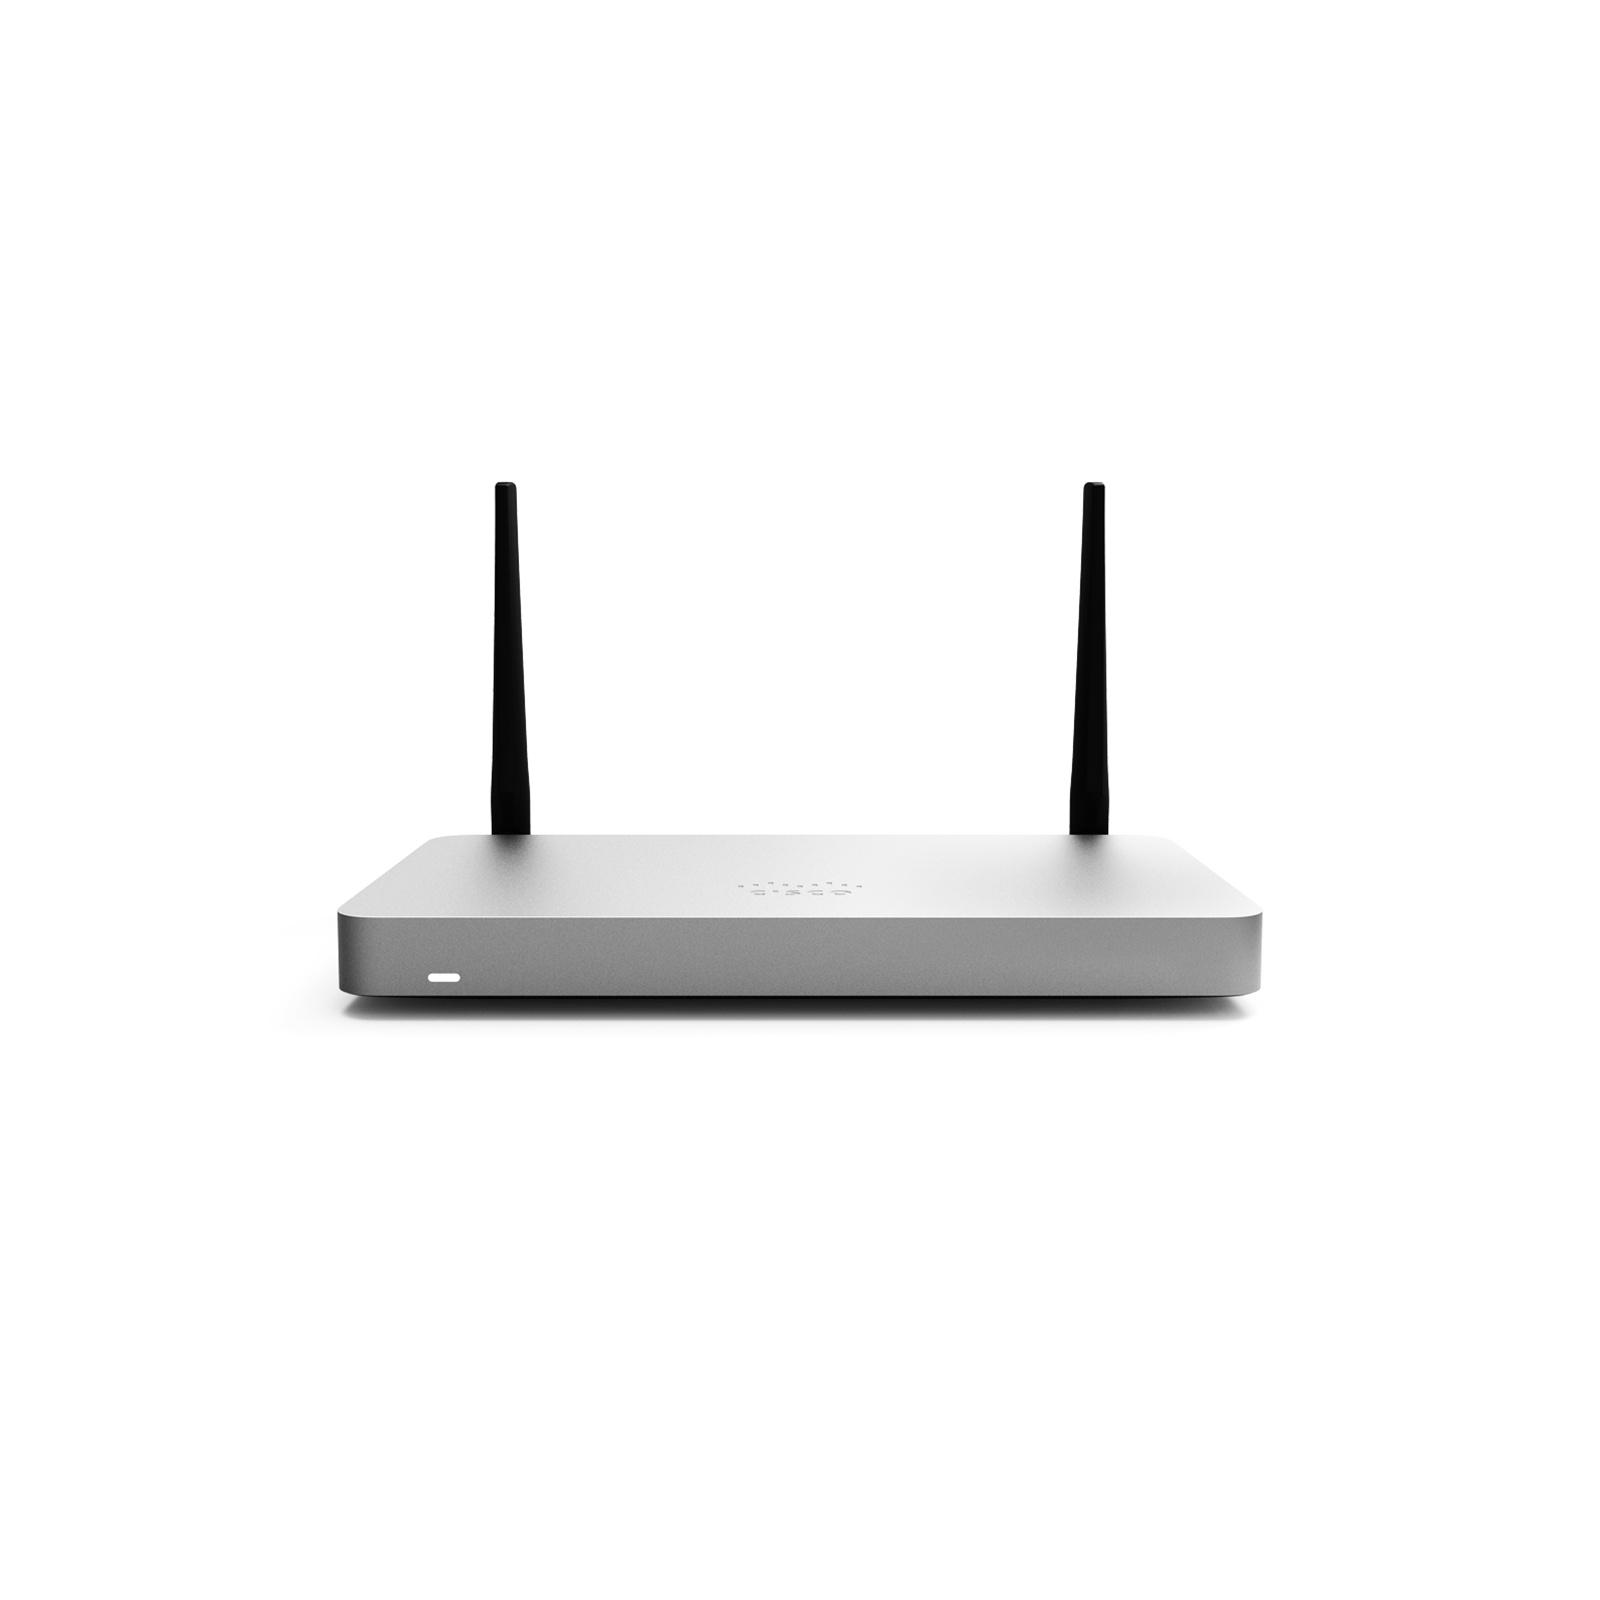 Buy the Cisco Meraki MX67C - LTE Router Security Appliance